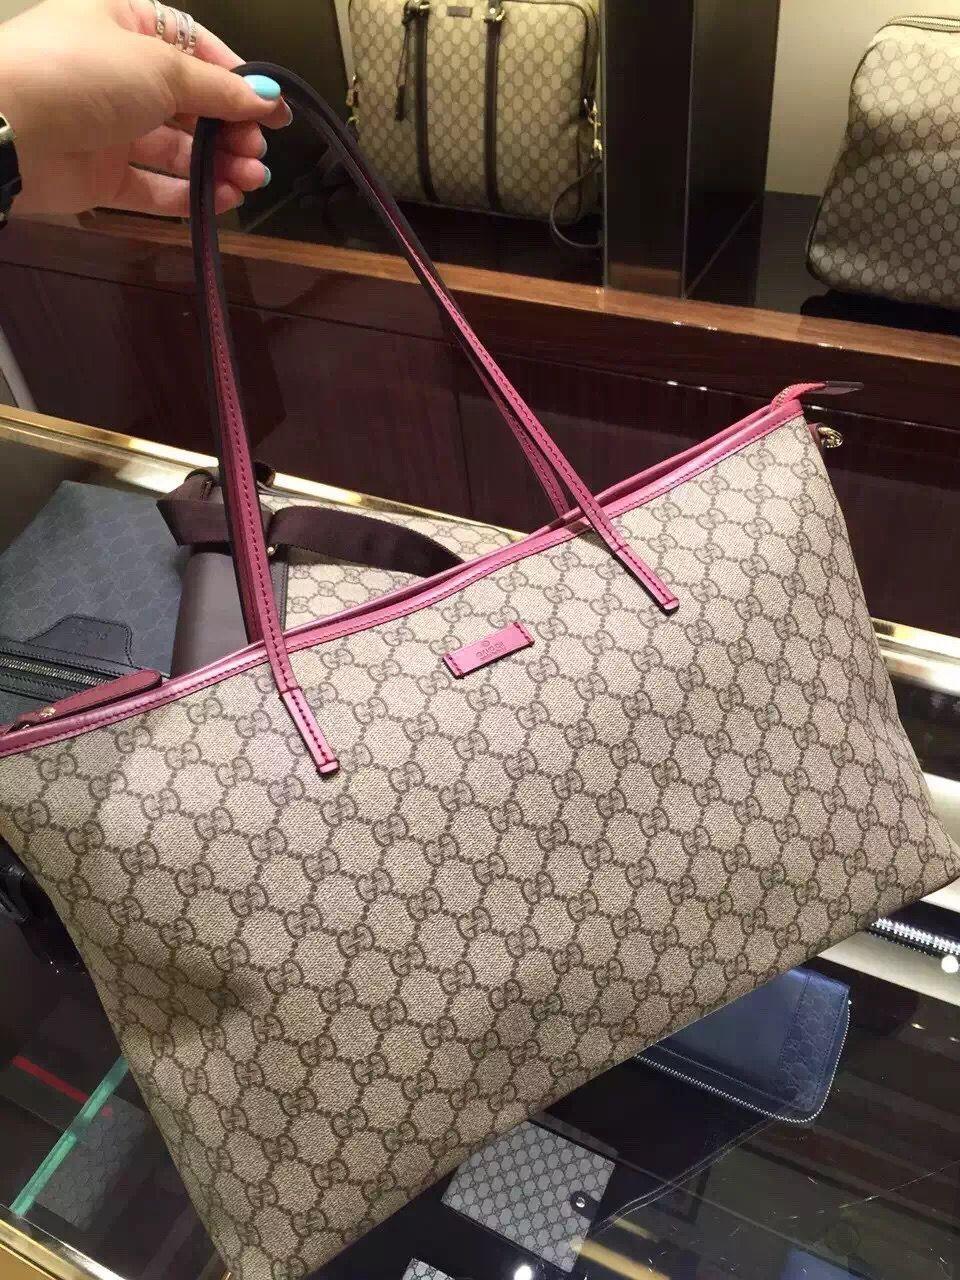 75f3834d198 Gucci GG Supreme Canvas Medium Tote Bag 353437 Rose